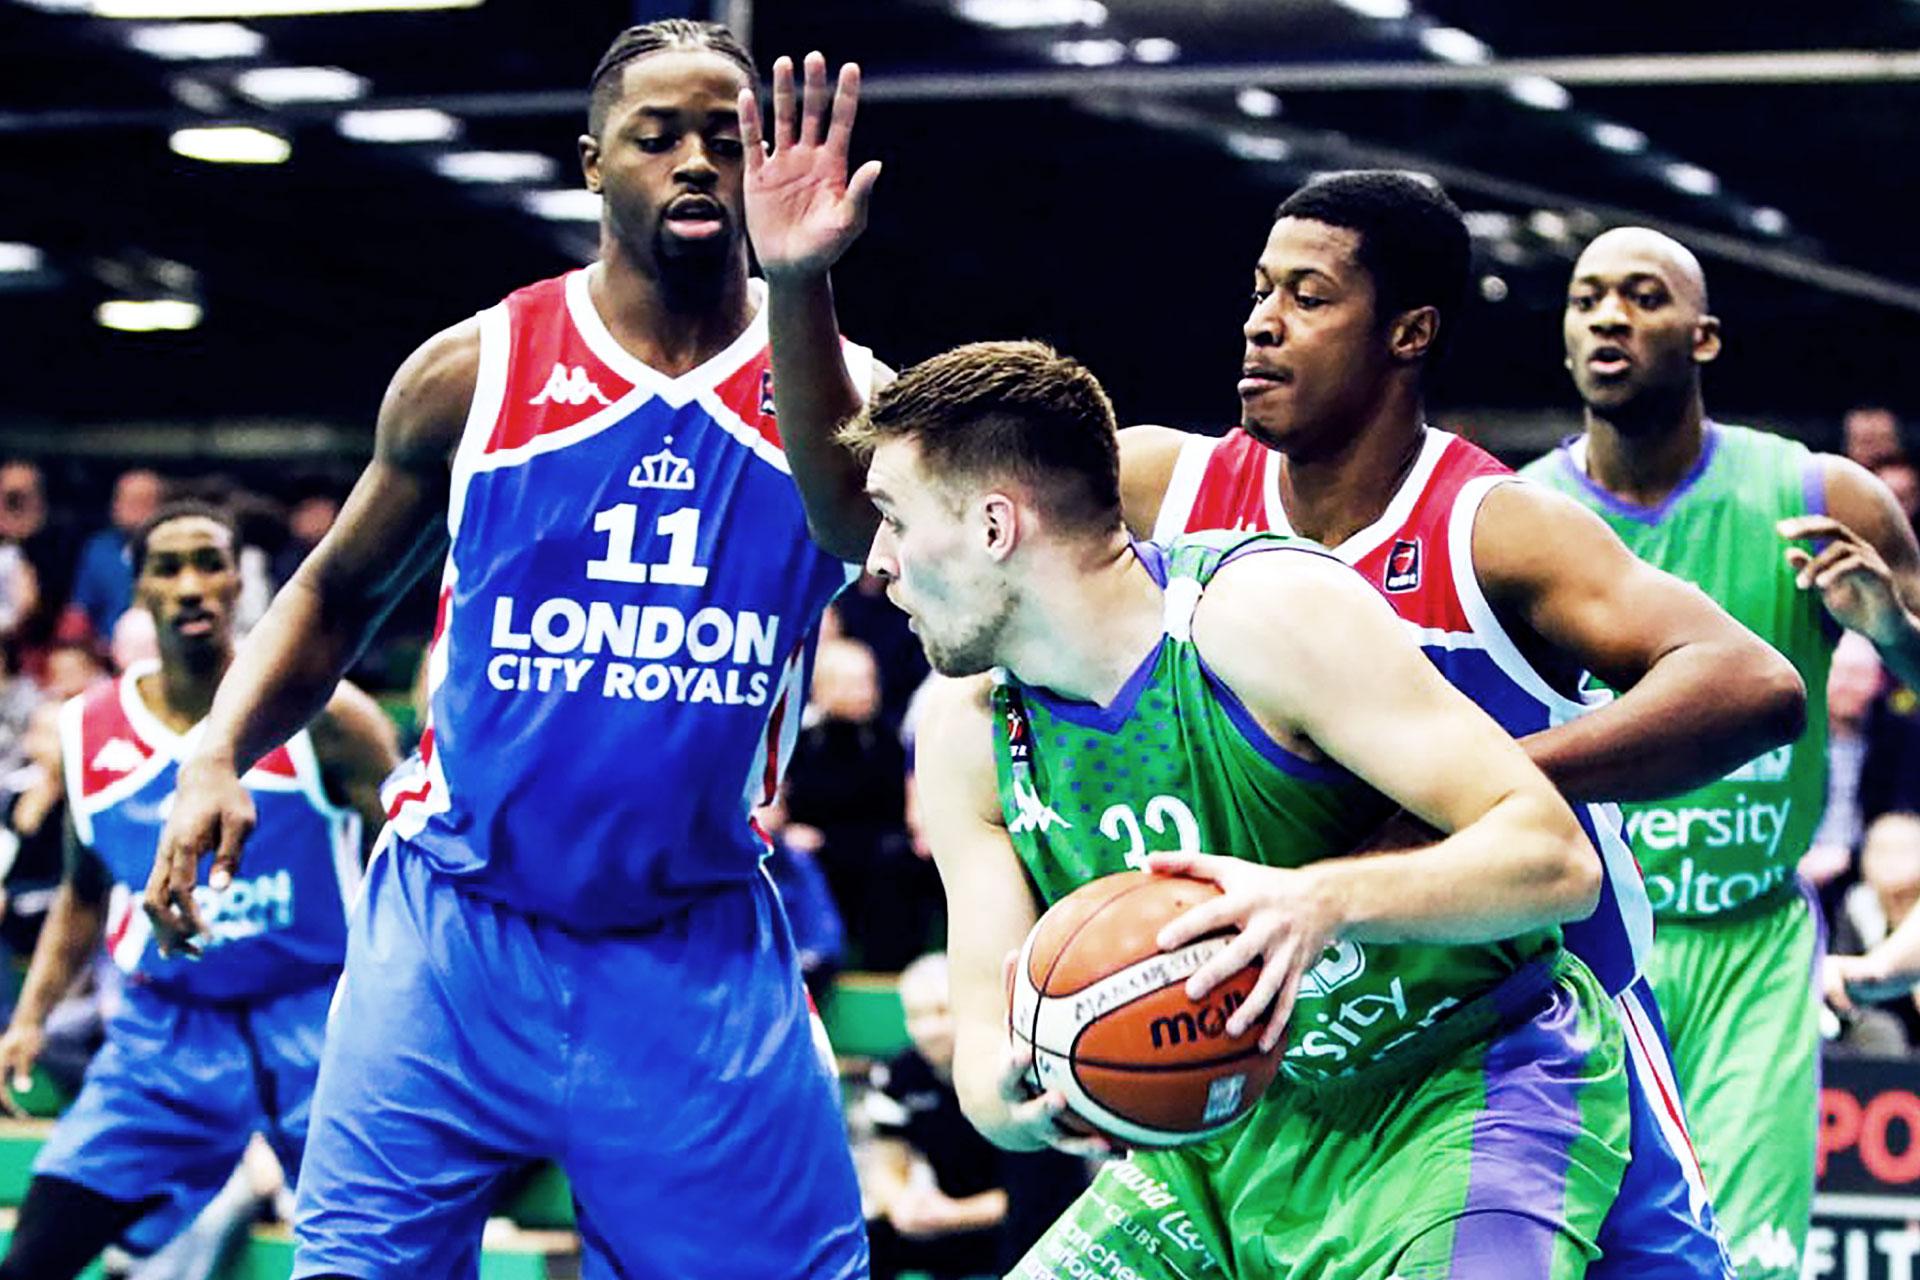 london-city-royals-basketball-by-orfi-media